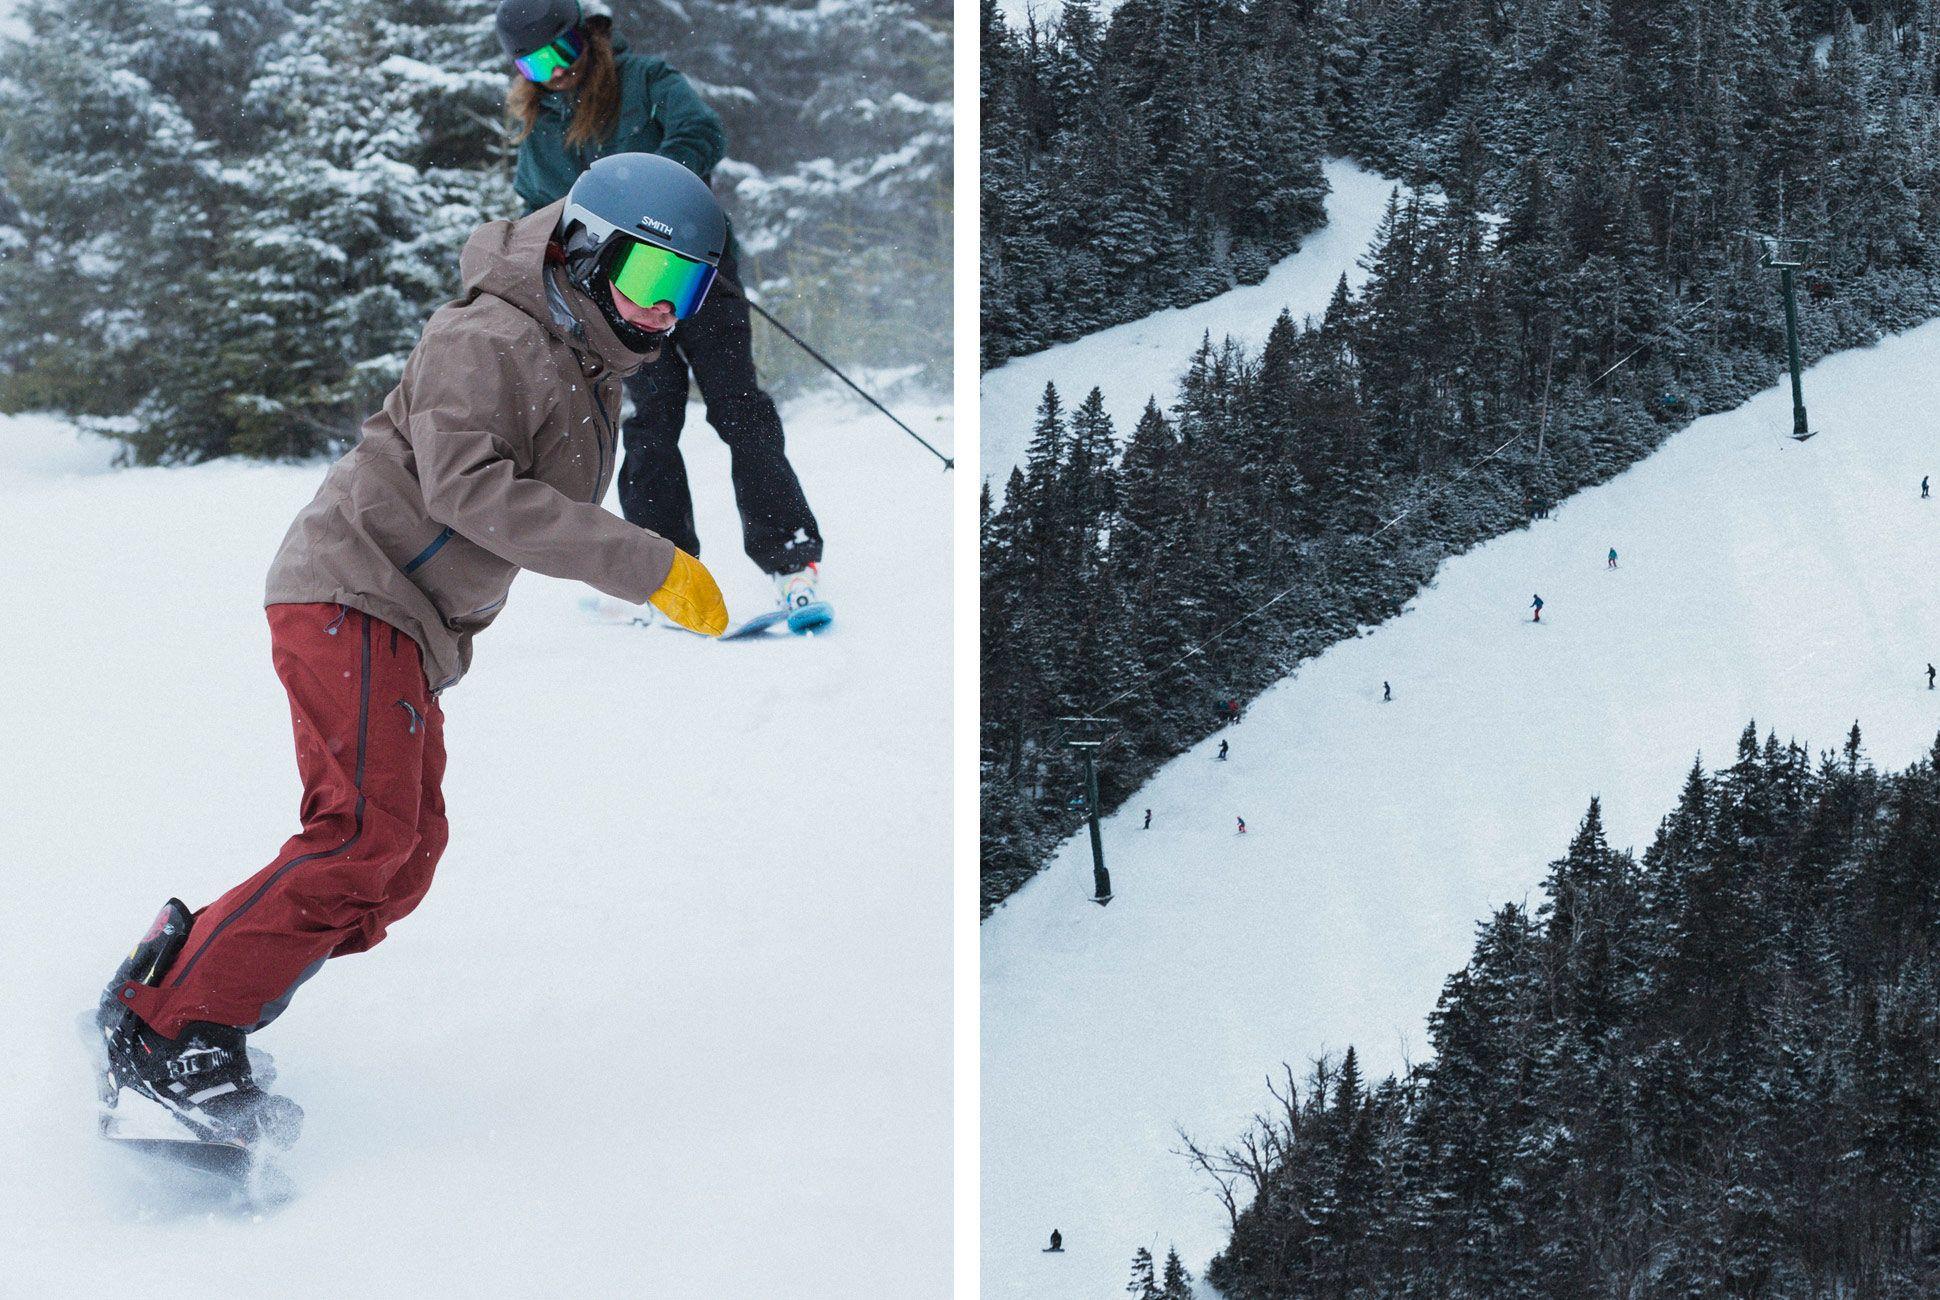 ultimate-ski-and-snow-gear-patrol-stio-slide-5